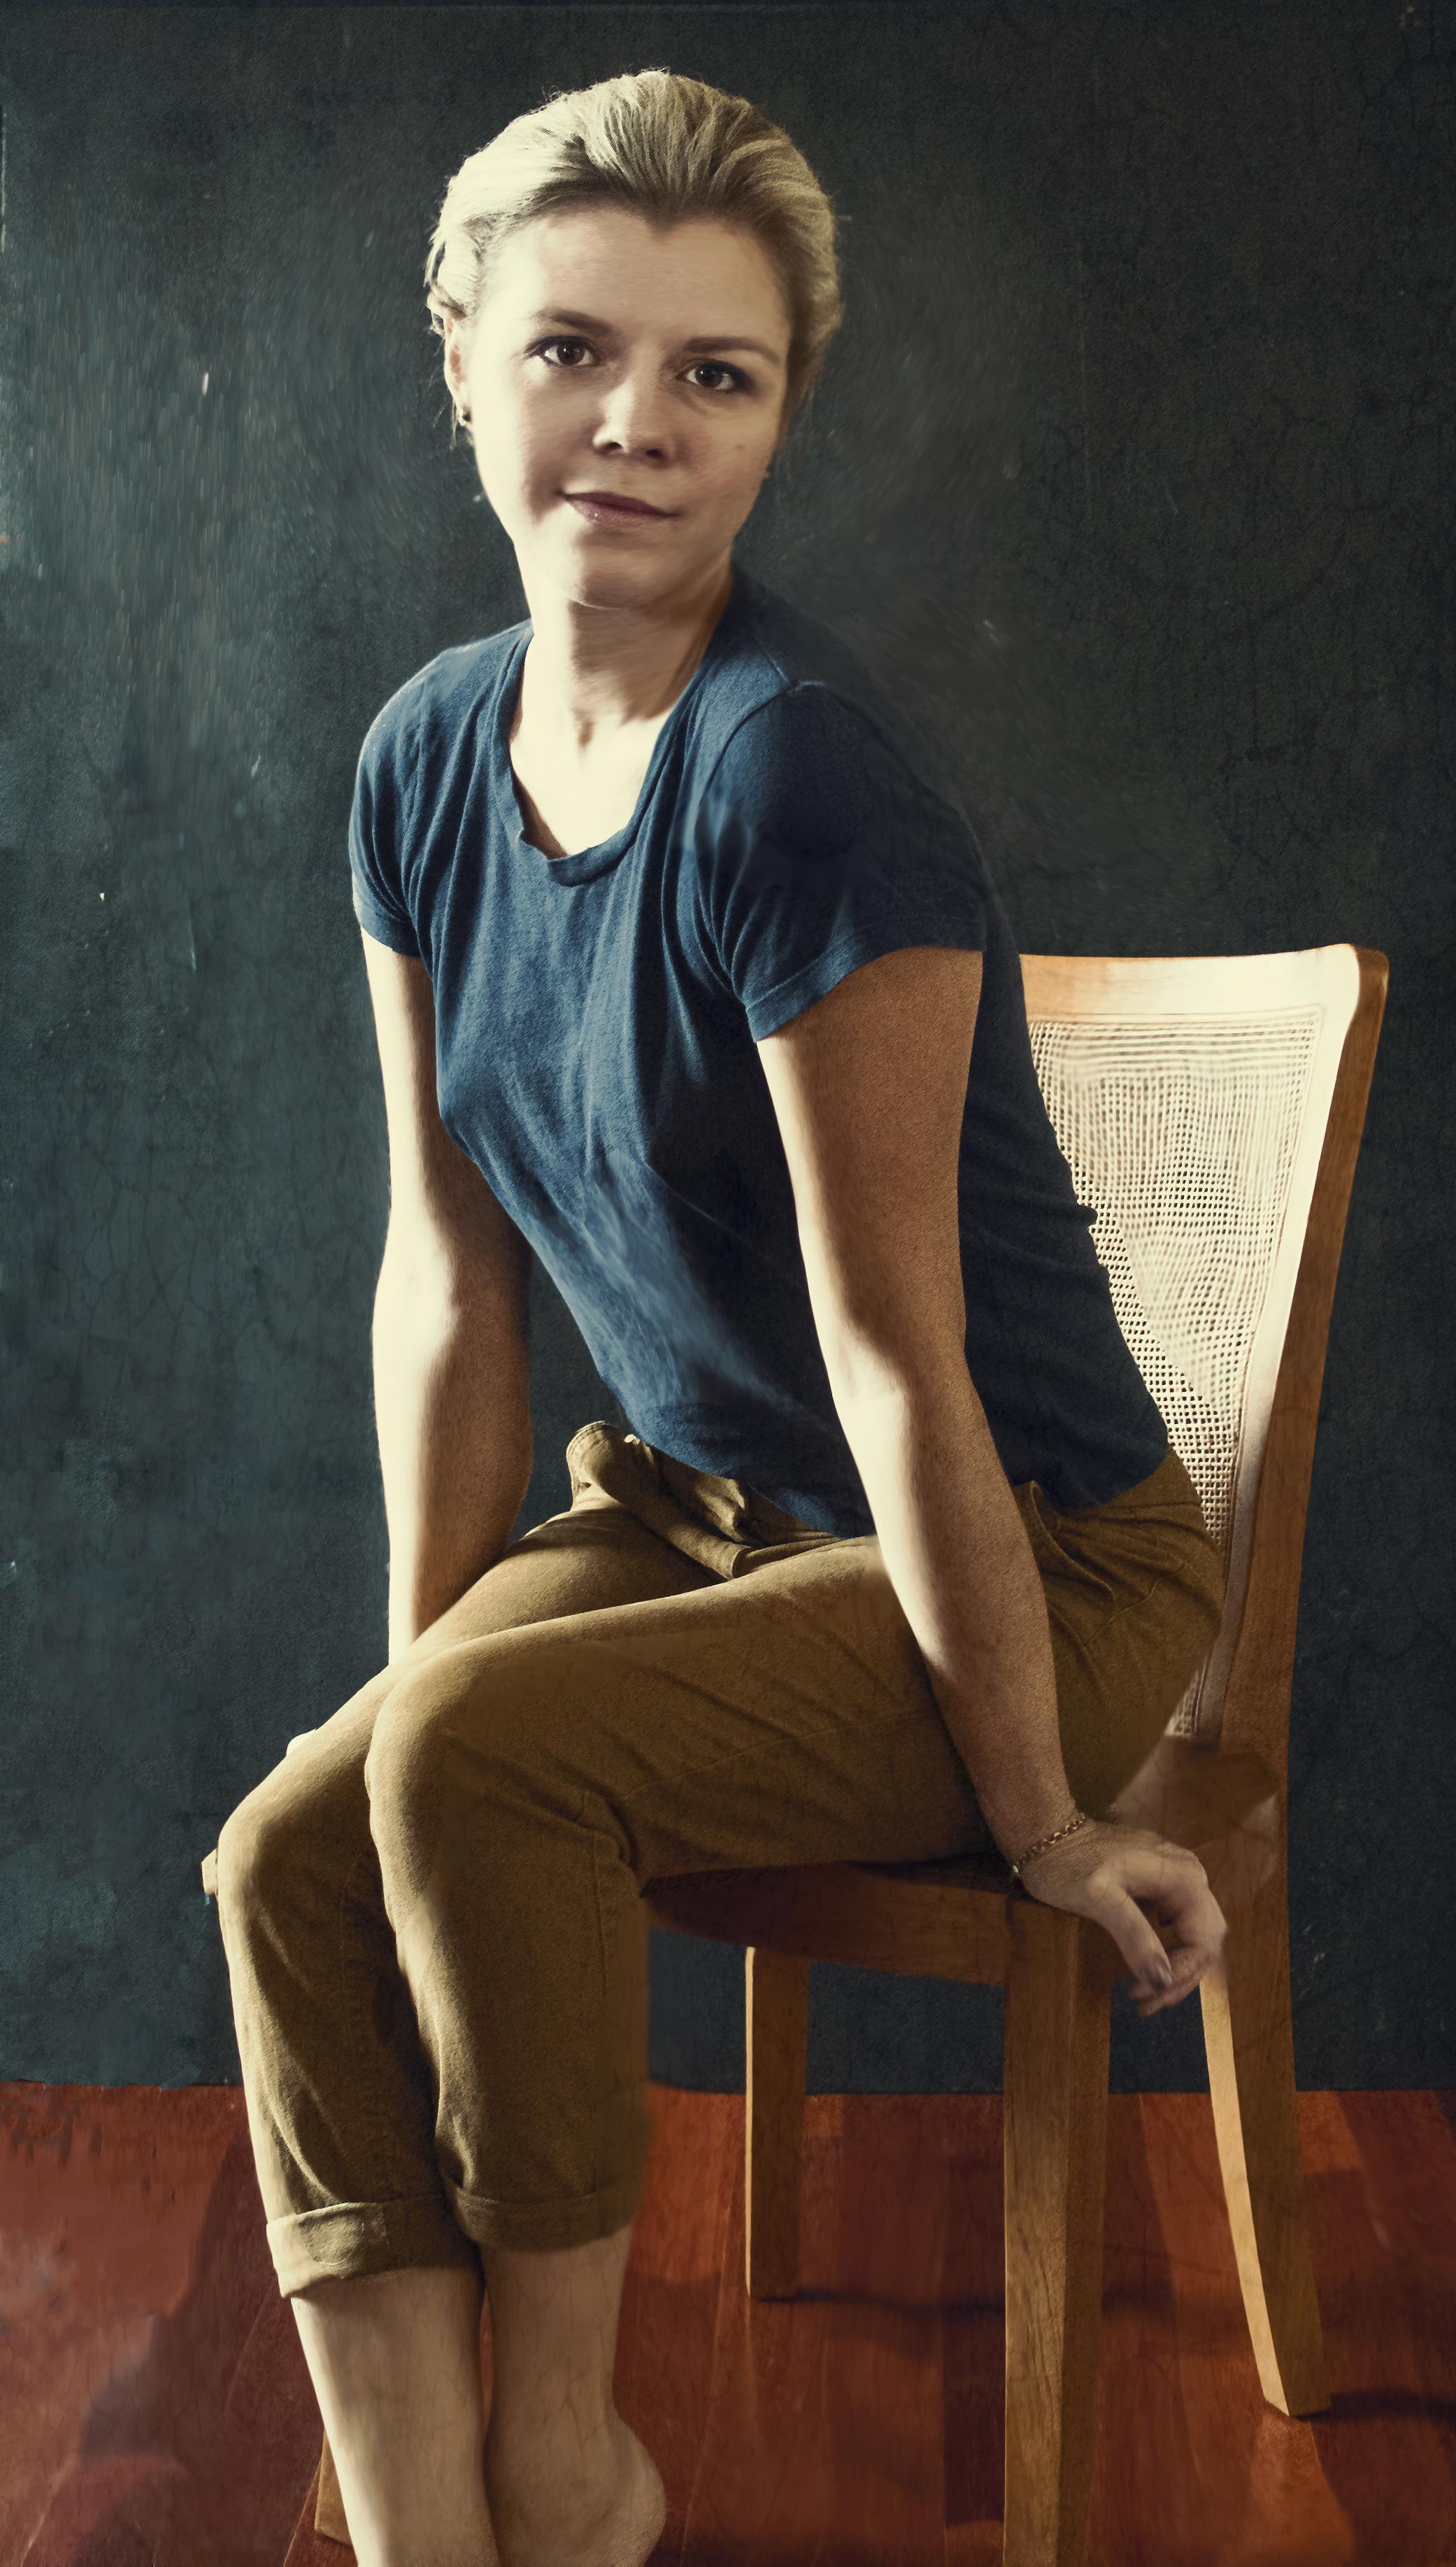 Self- Portrait - Jenessa Hansford - 2017